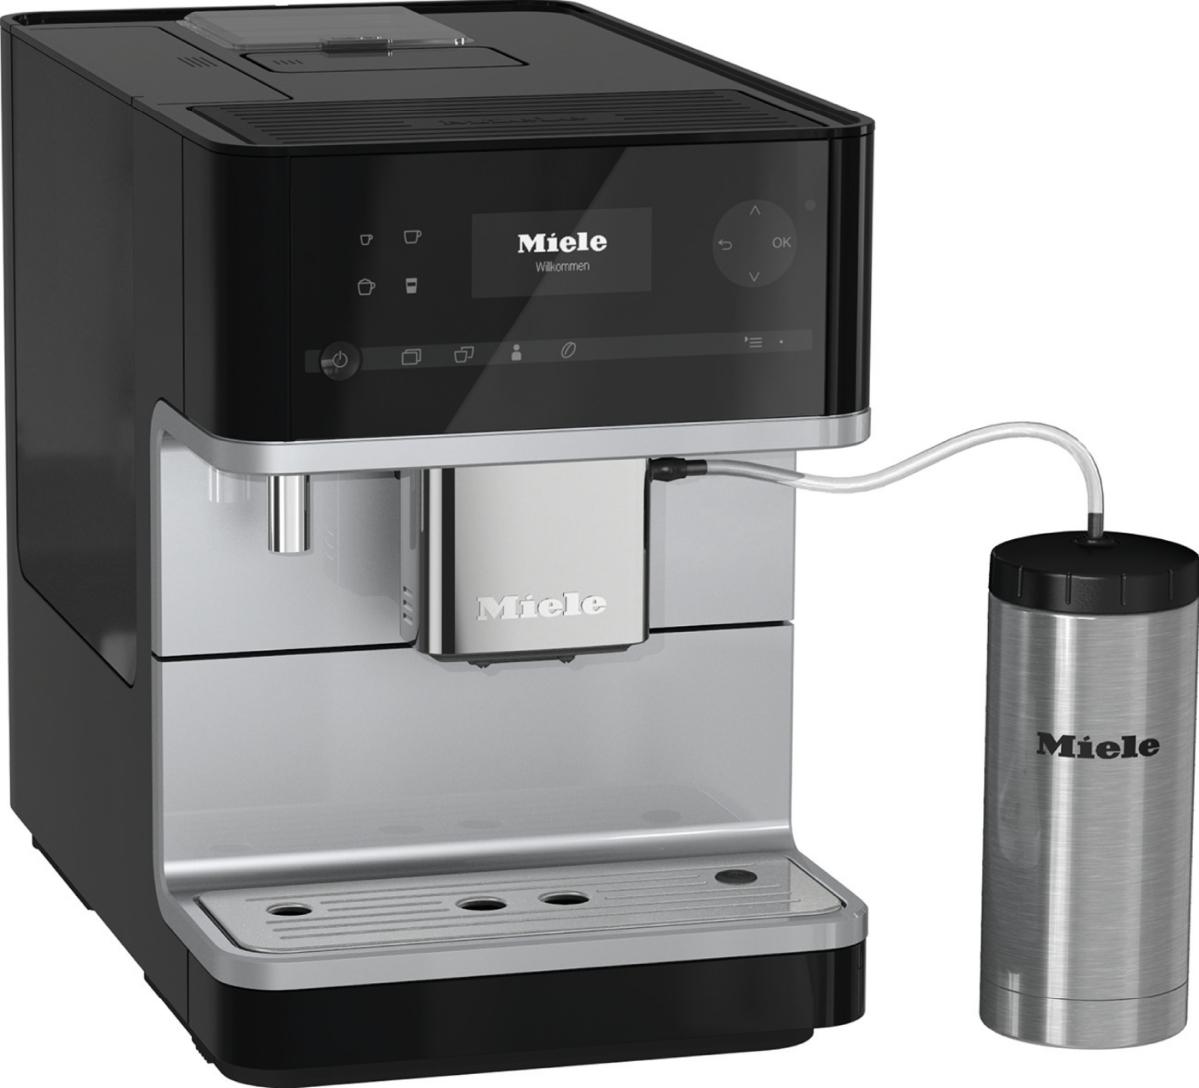 Miele Cm 6350 Countertop Coffee Machine